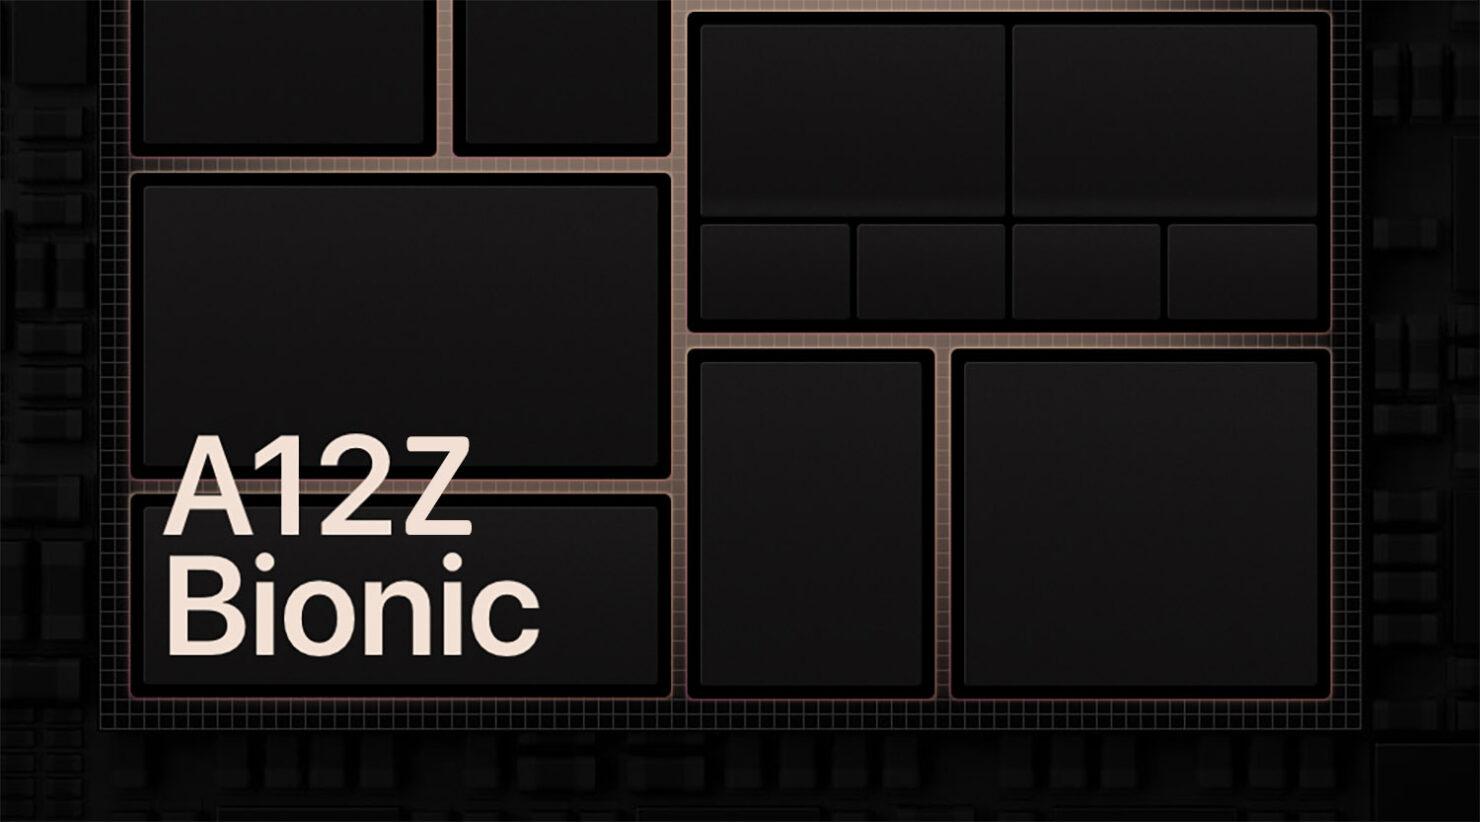 Apple's A12Z Bionic GPU Beats Both Ryzen 5 4500U, Core i7-1065G7 iGPUs in OpenCL Test Running macOS 11 Through Rosetta 2